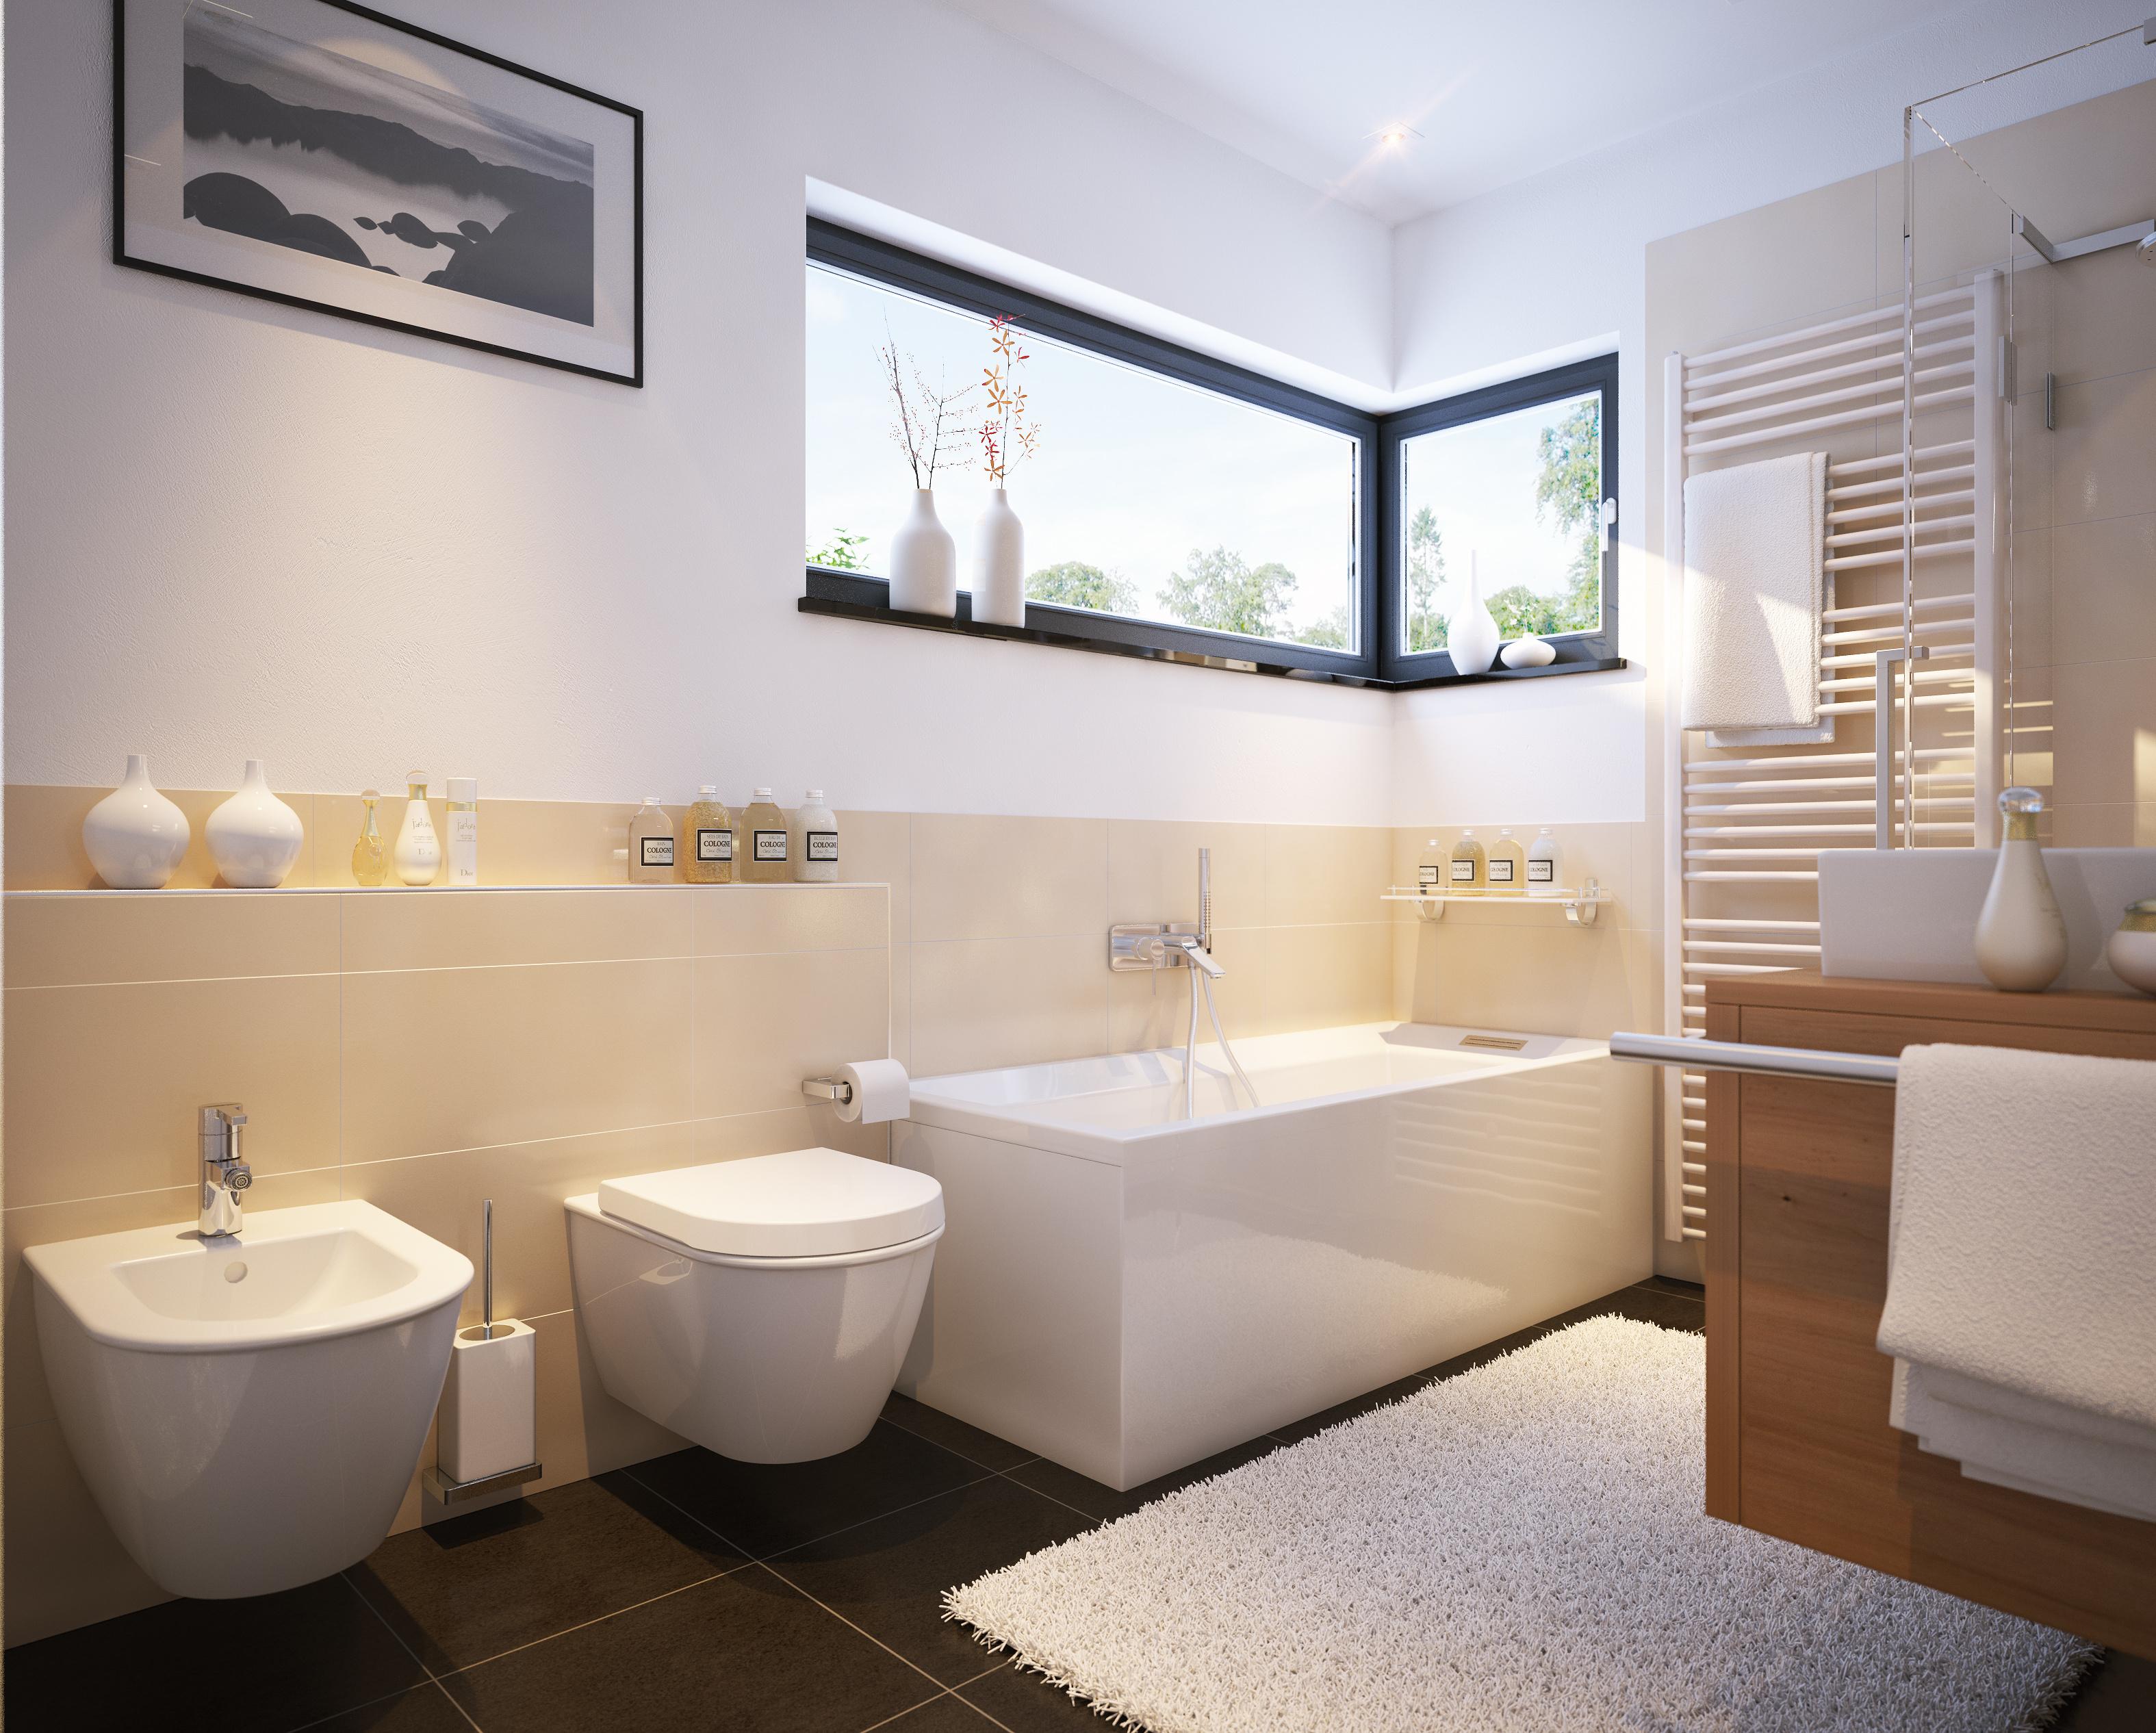 Moderne Badezimmer 21   Trends, Ideen & Beispielbilder   HEROLD